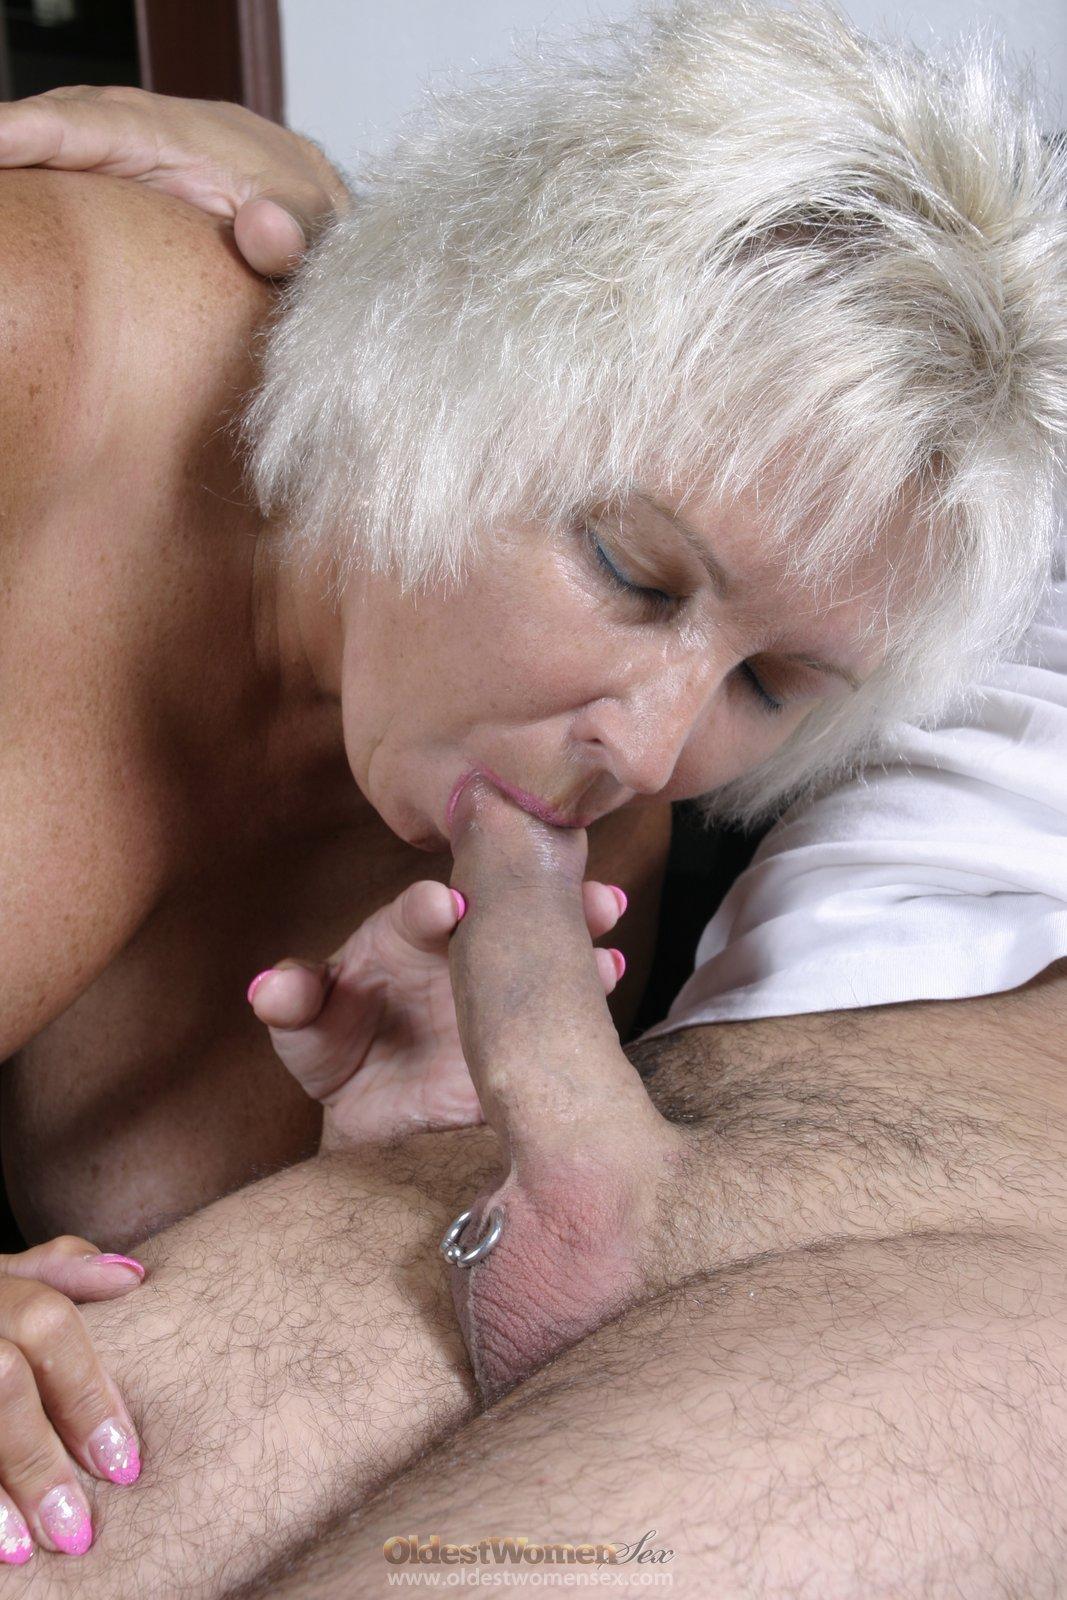 Slut mature woman enjoys sucking big black cock